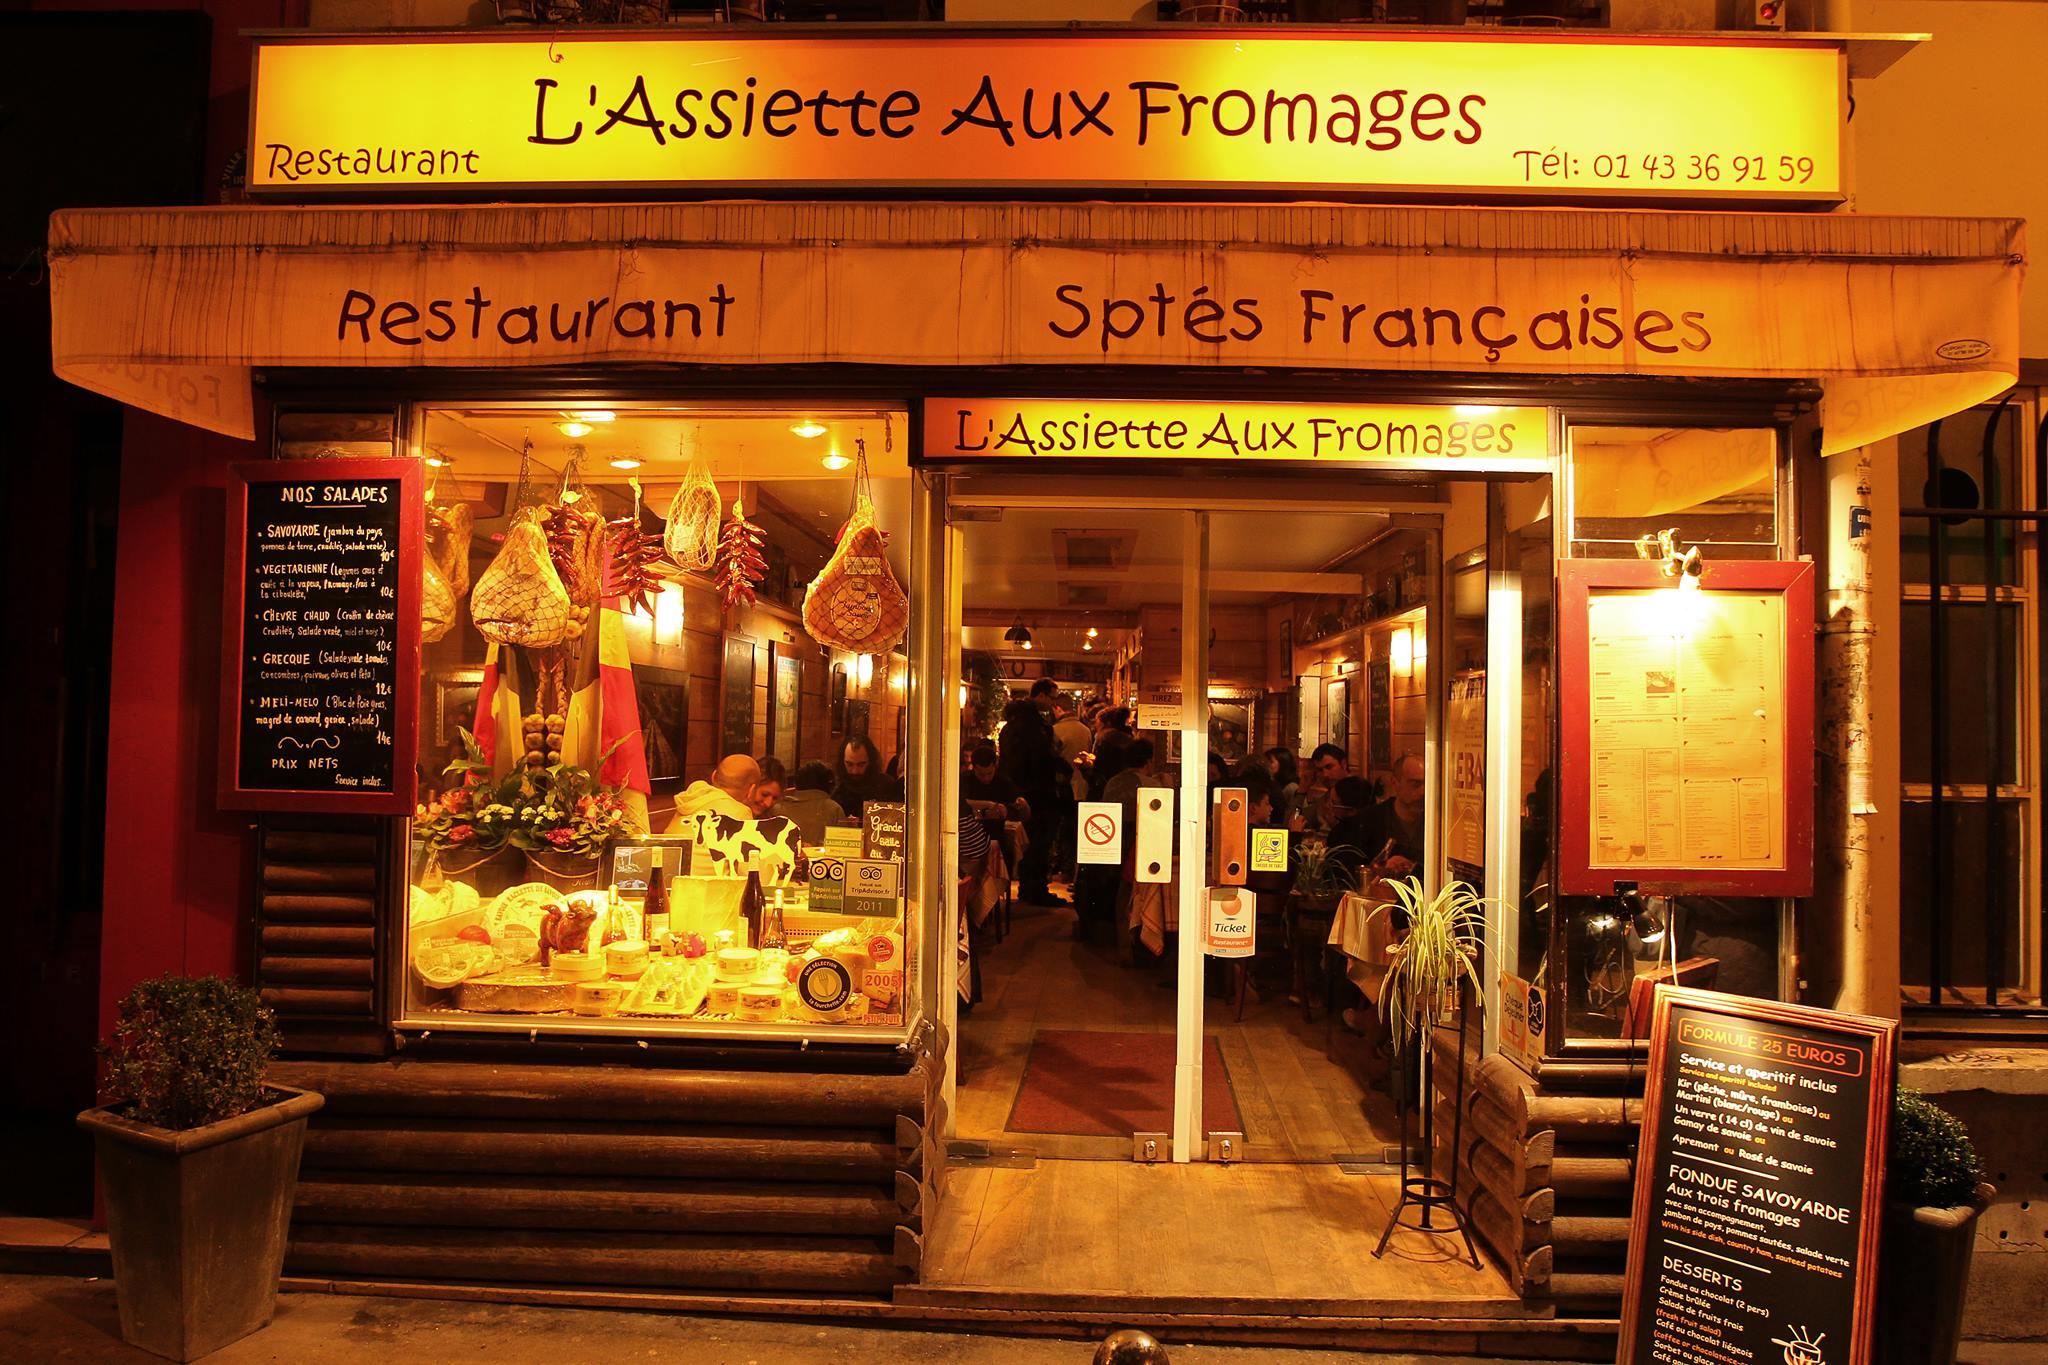 Фондю ресторант L'Assiette aux Fromages в Париж | Fondue.bg